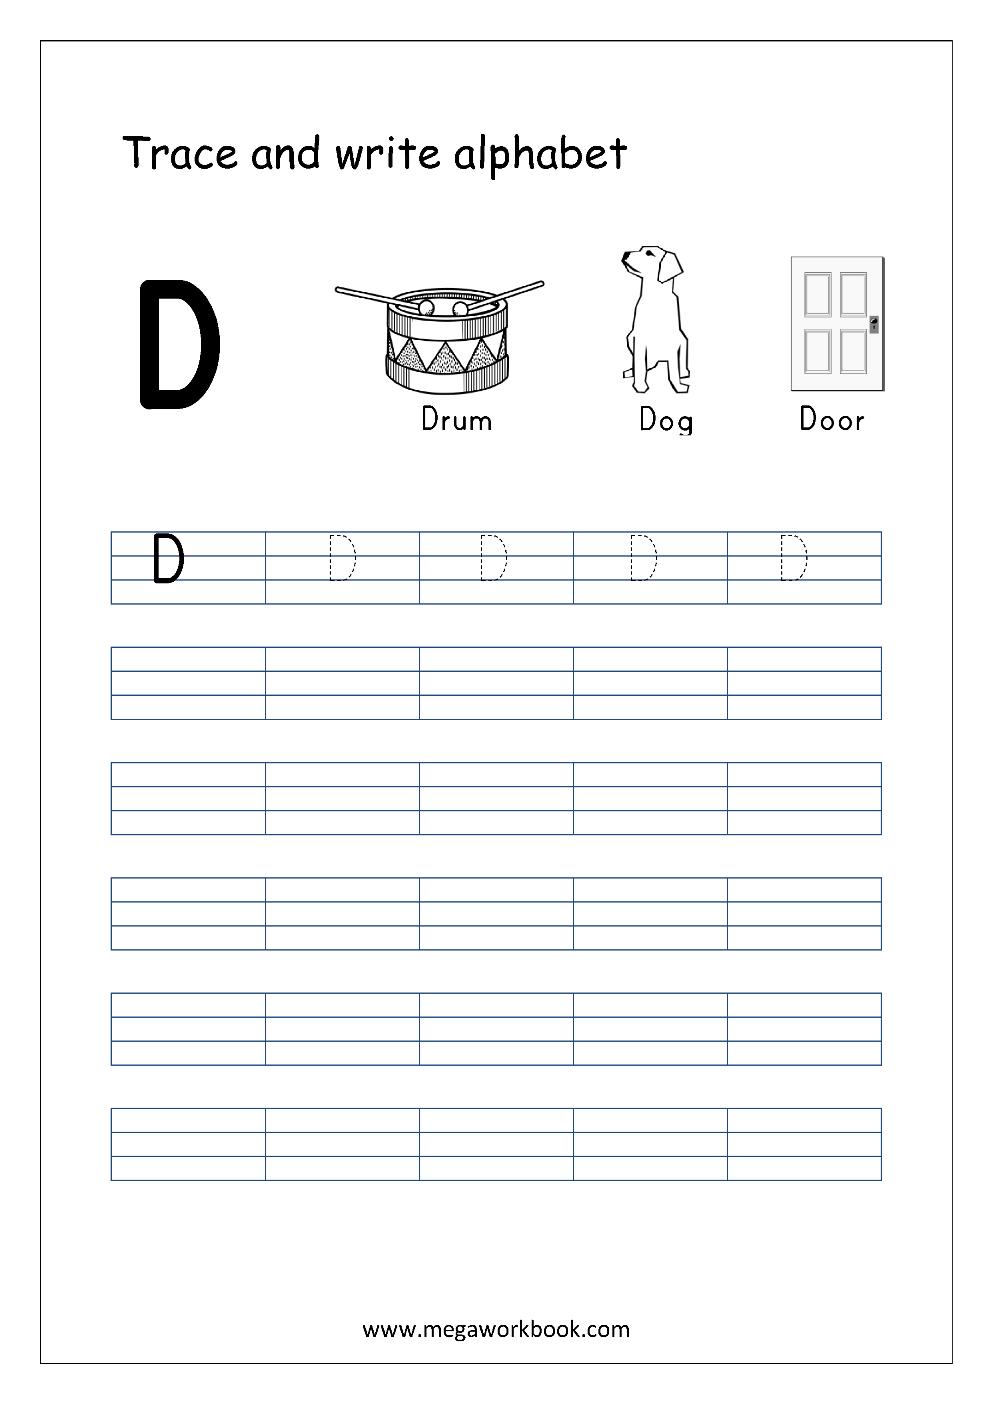 Free English Worksheets Alphabet Writing Capital Letters Letter Tracing Writing Mega Alphabet Writing Practice Letter Writing Practice Alphabet Writing [ 1403 x 992 Pixel ]